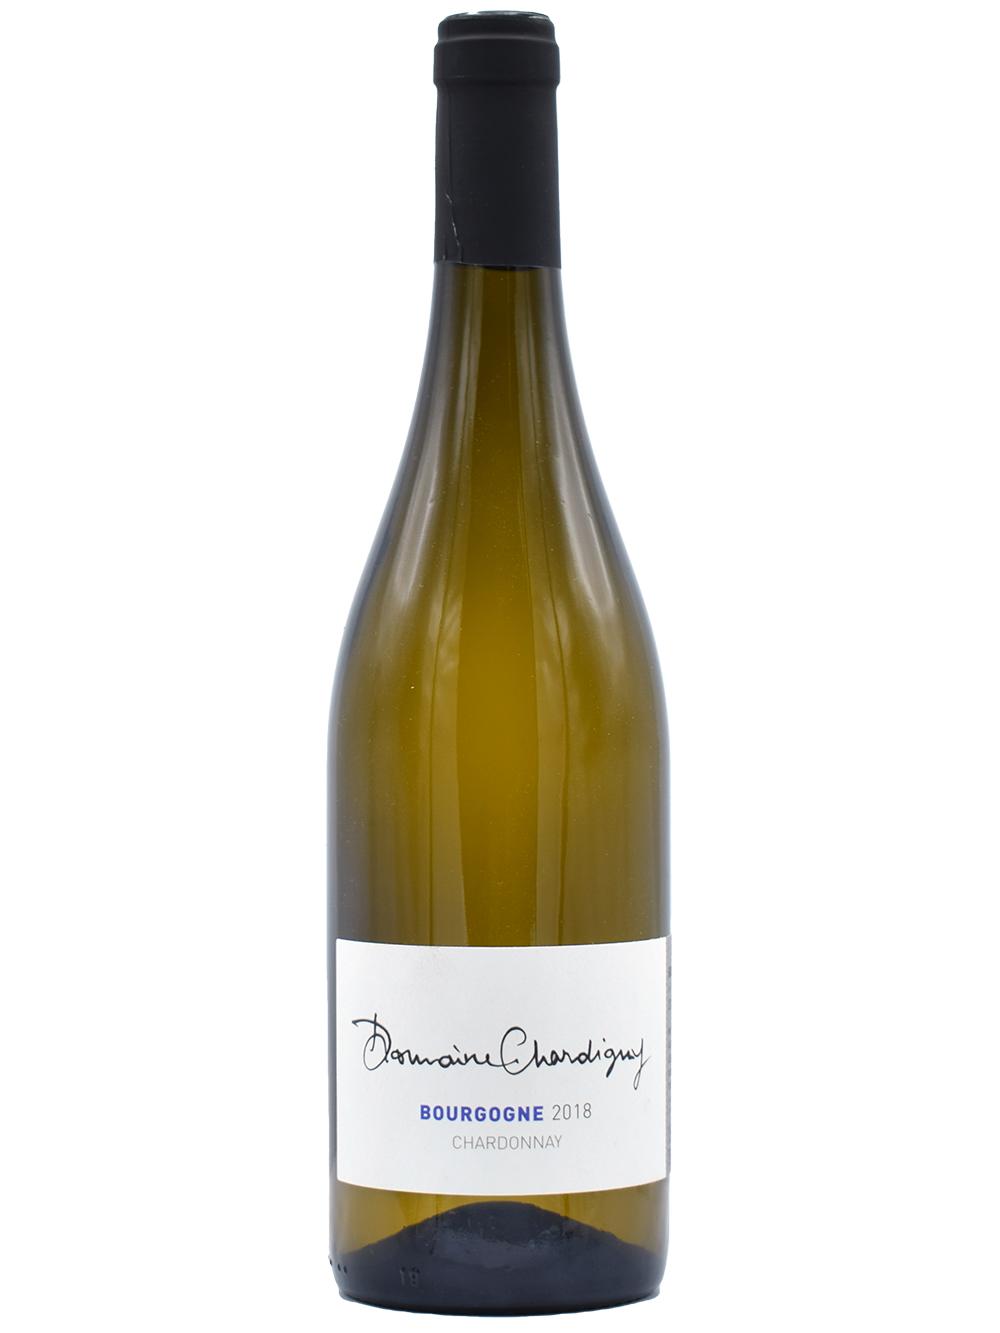 2018 Bourgogne Chardonnay